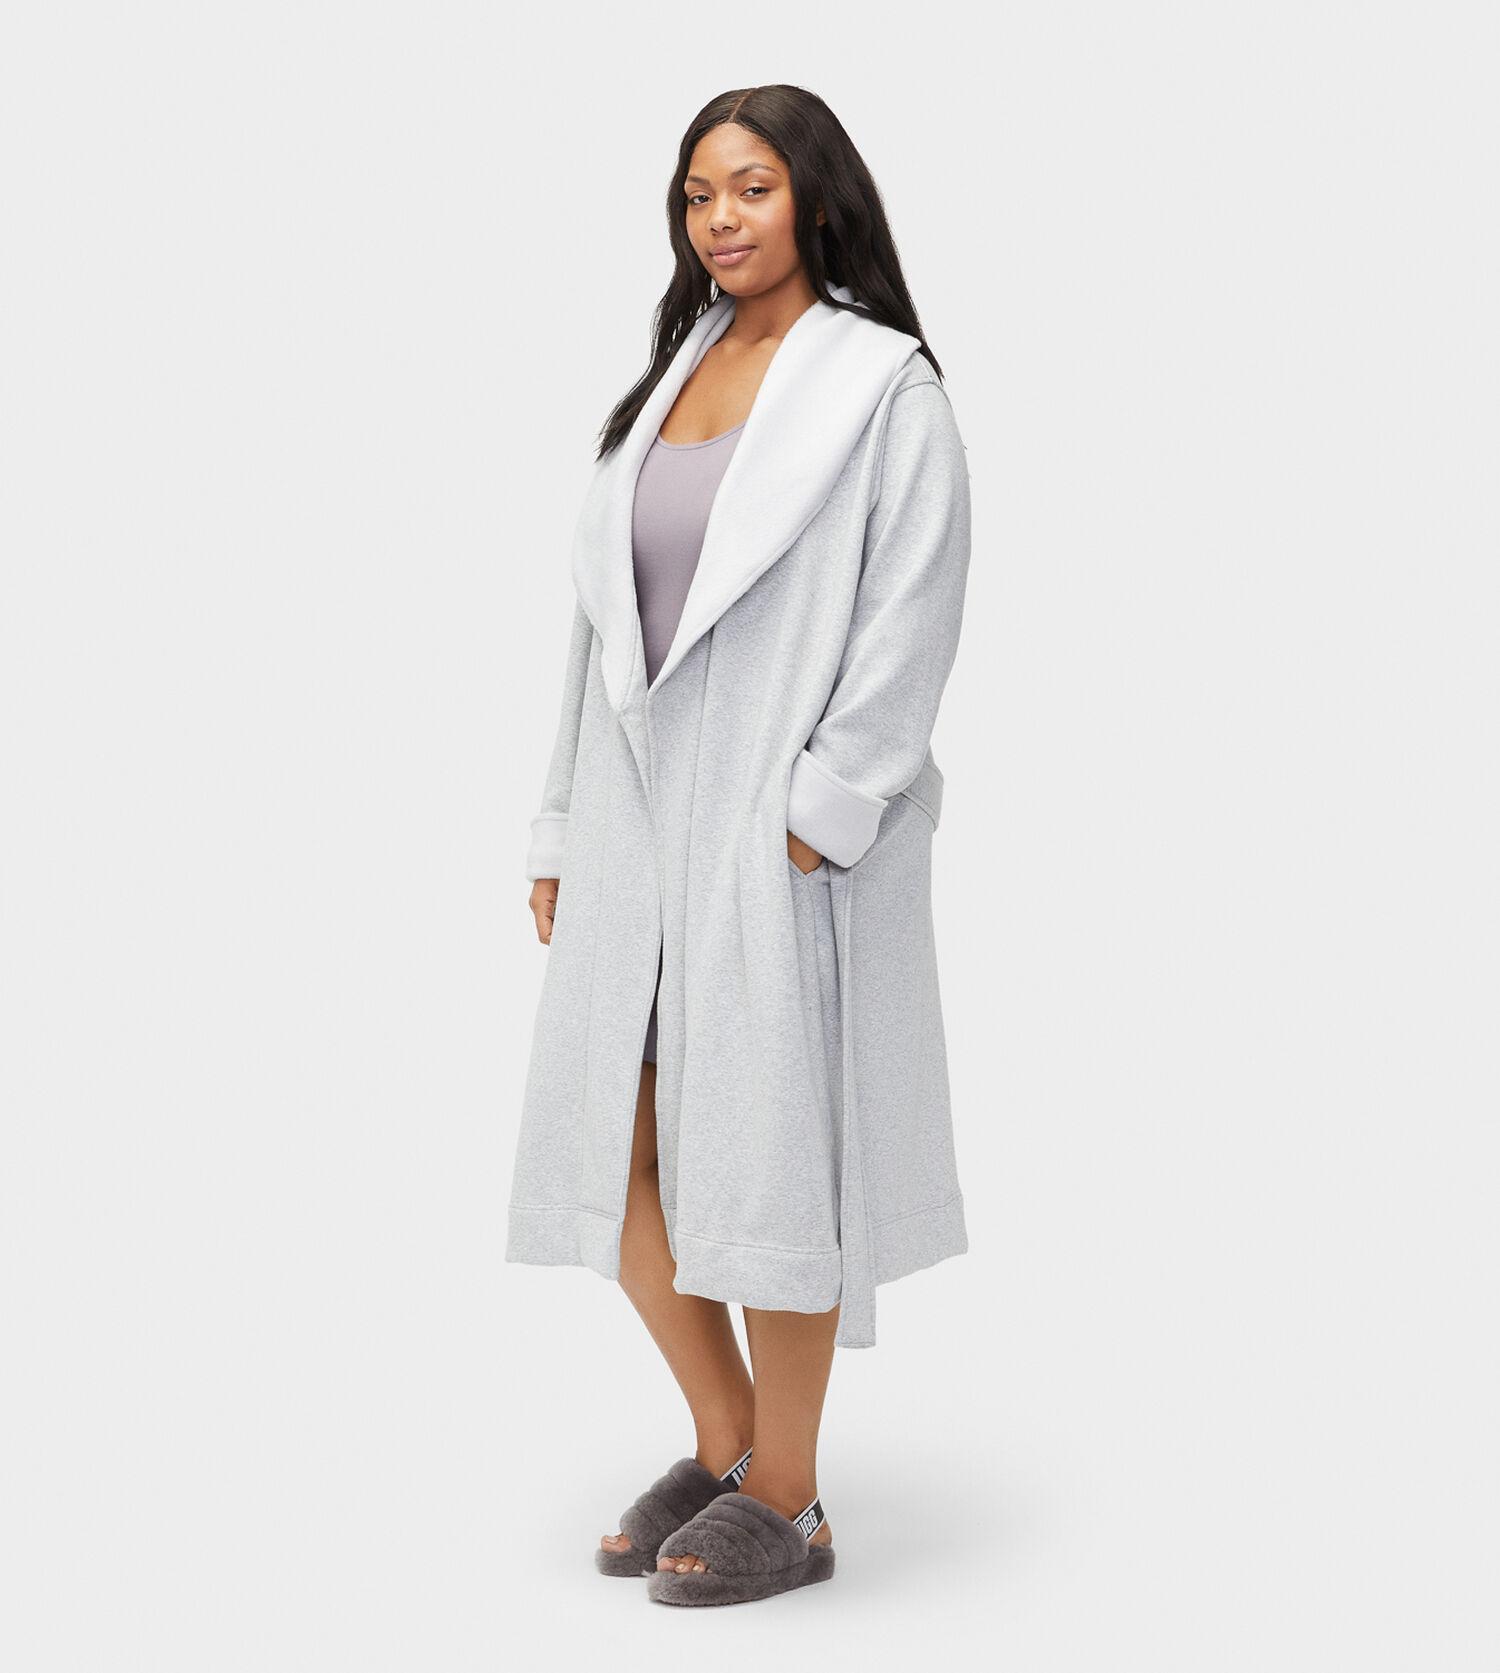 07d939d58d Duffield II Plus Robe - Ugg (US)